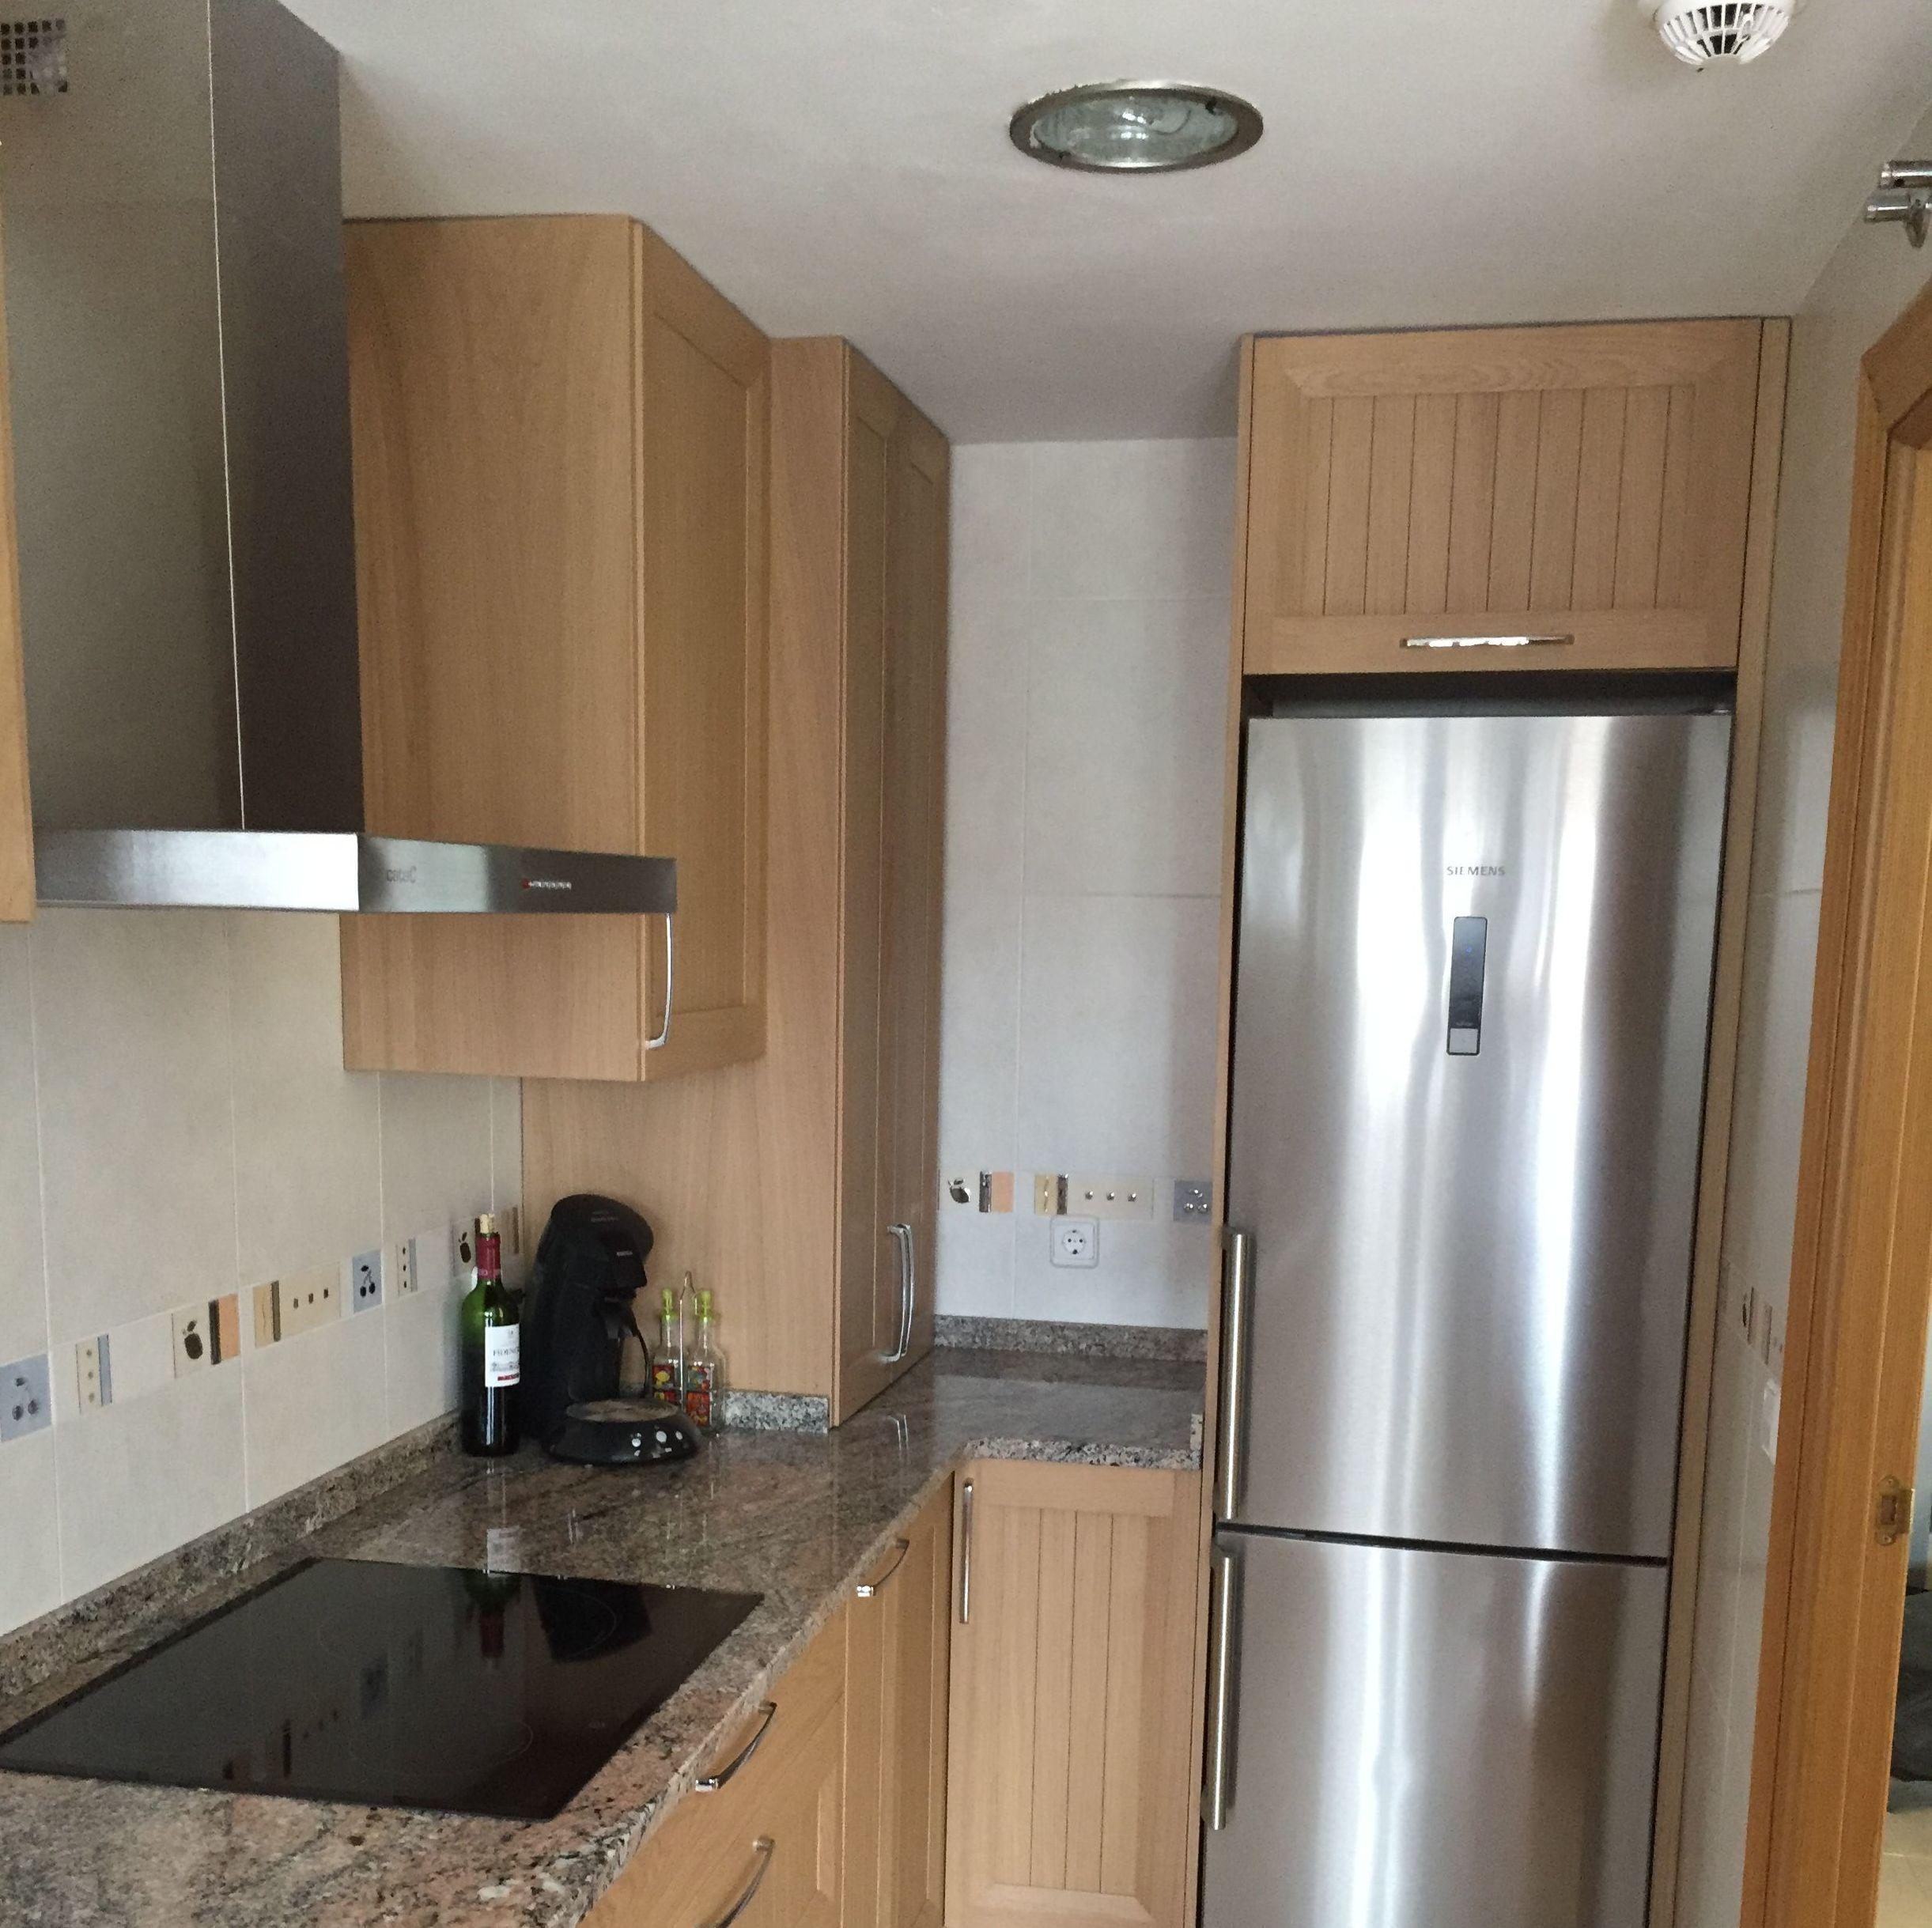 Gabinetes de cocina baratos gabinetes de cocina baratos for Cocina baratas precios